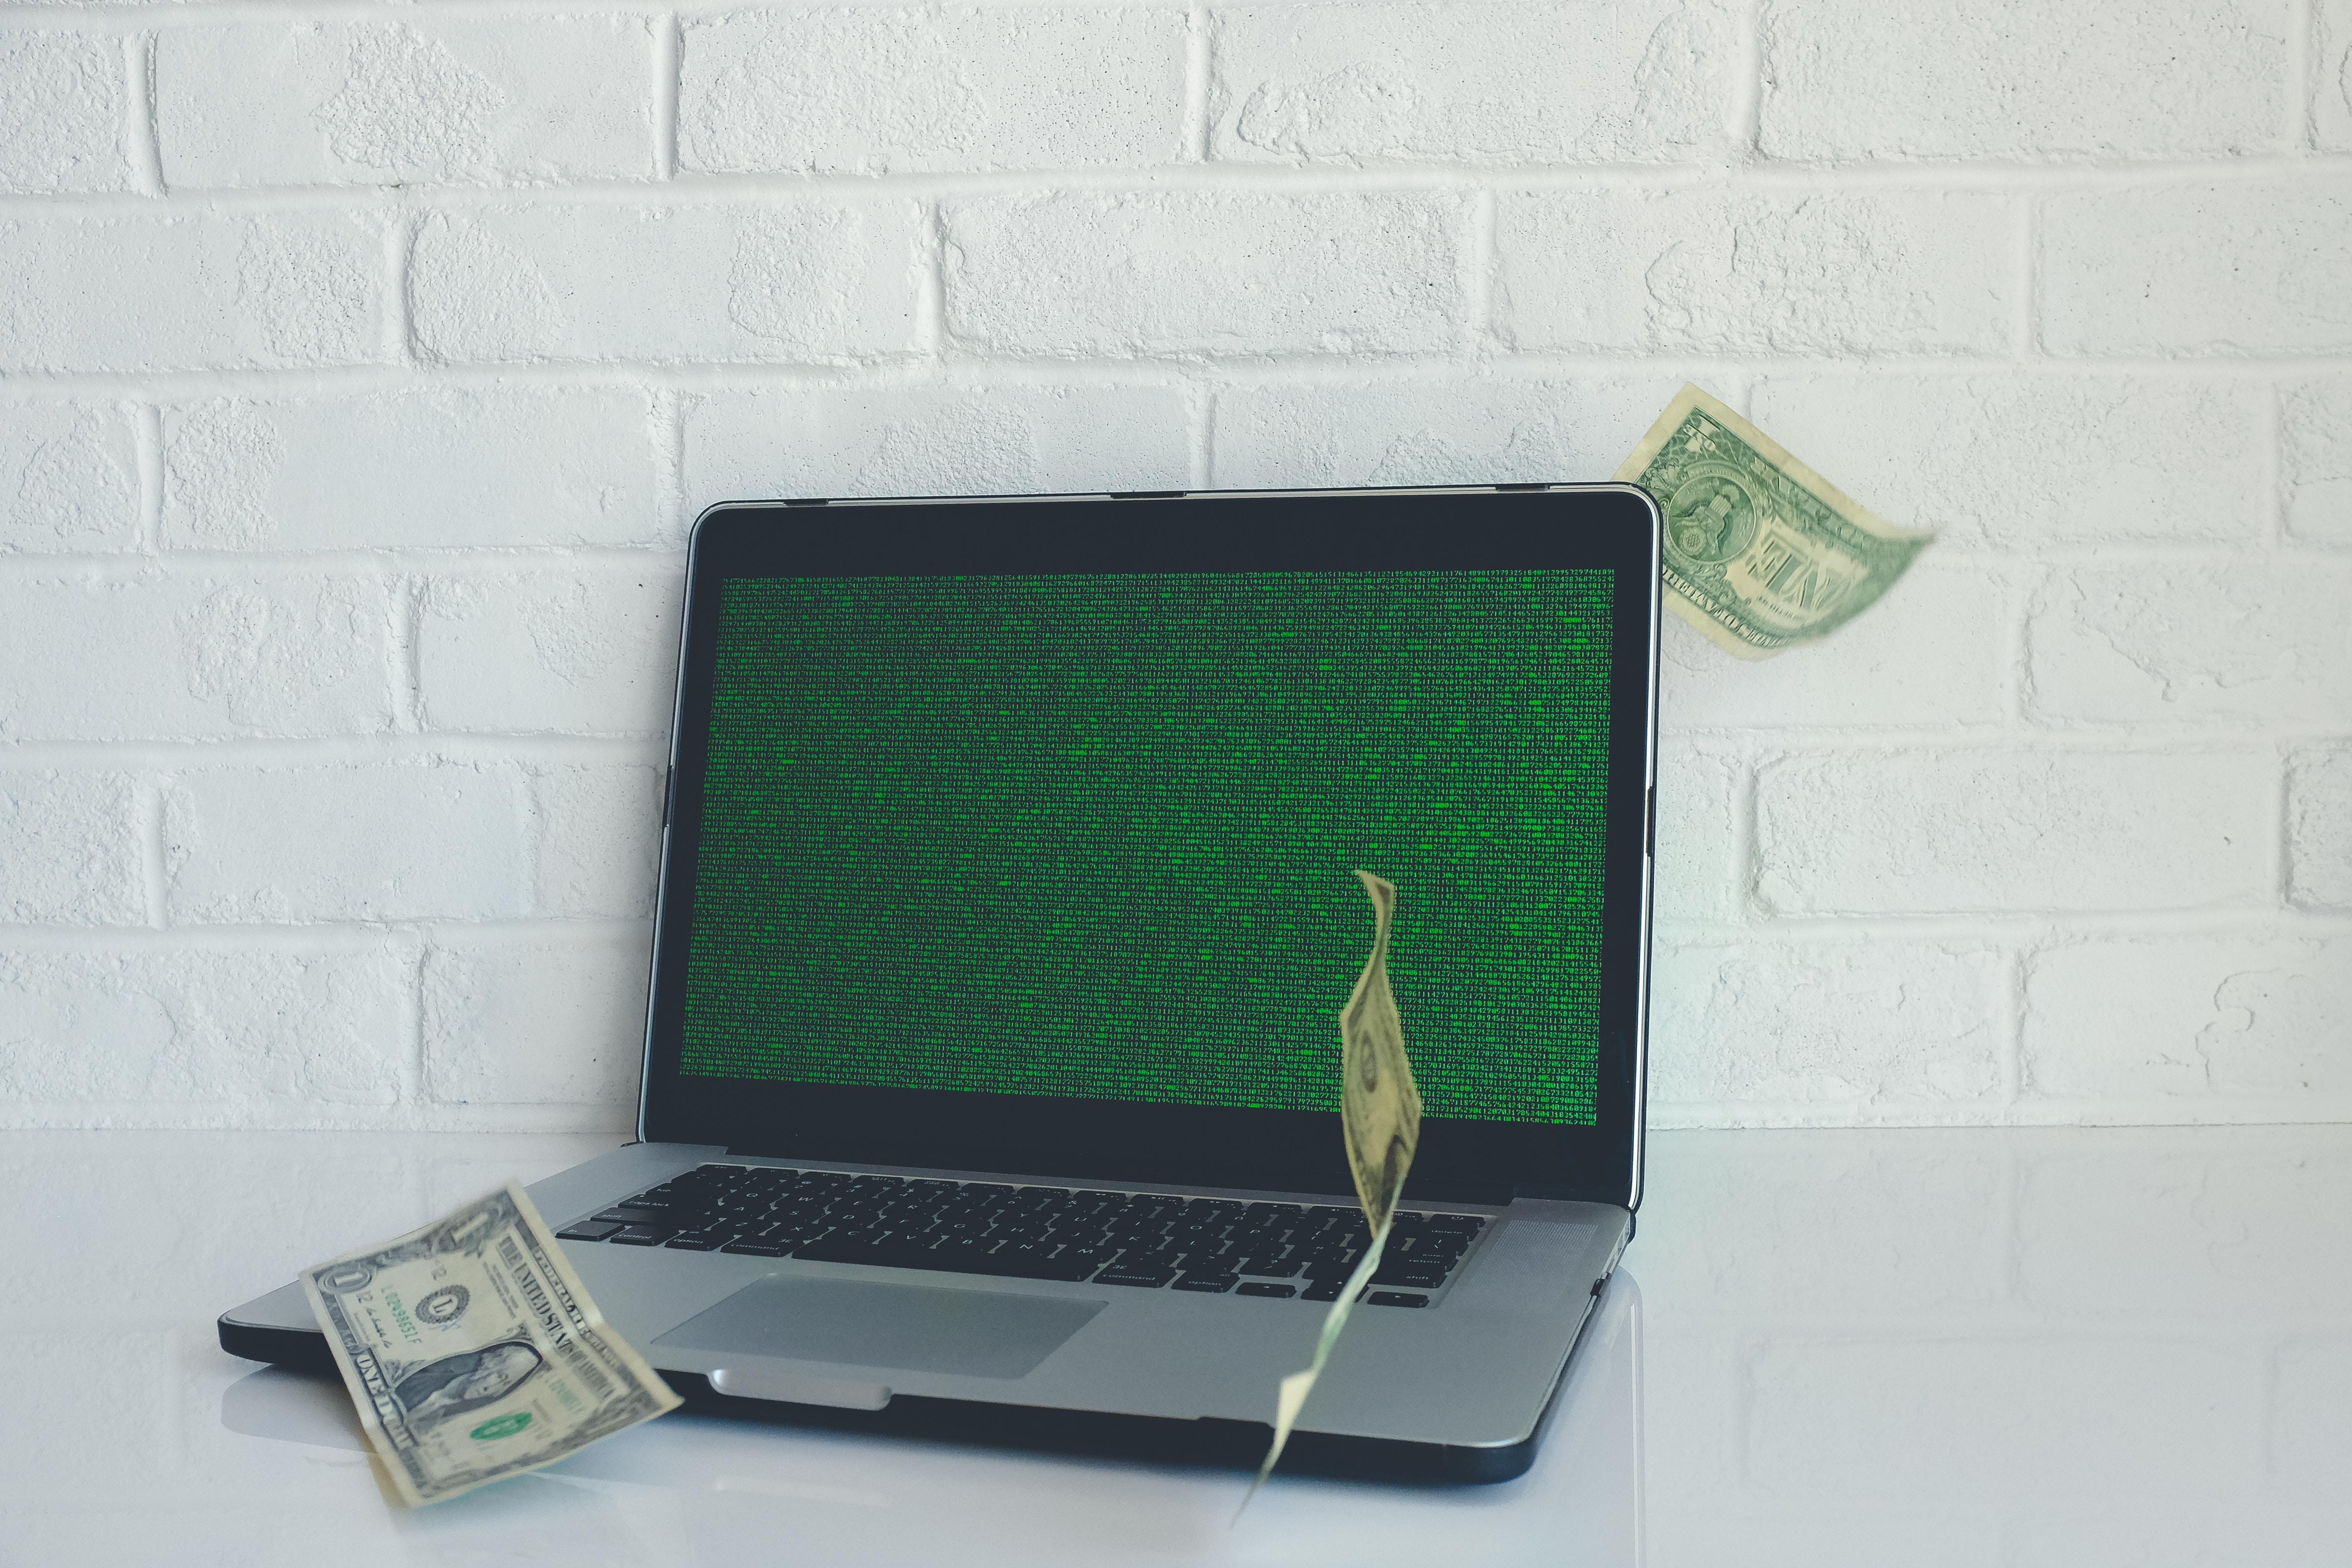 FTC shuts down crypto Ponzi schemers